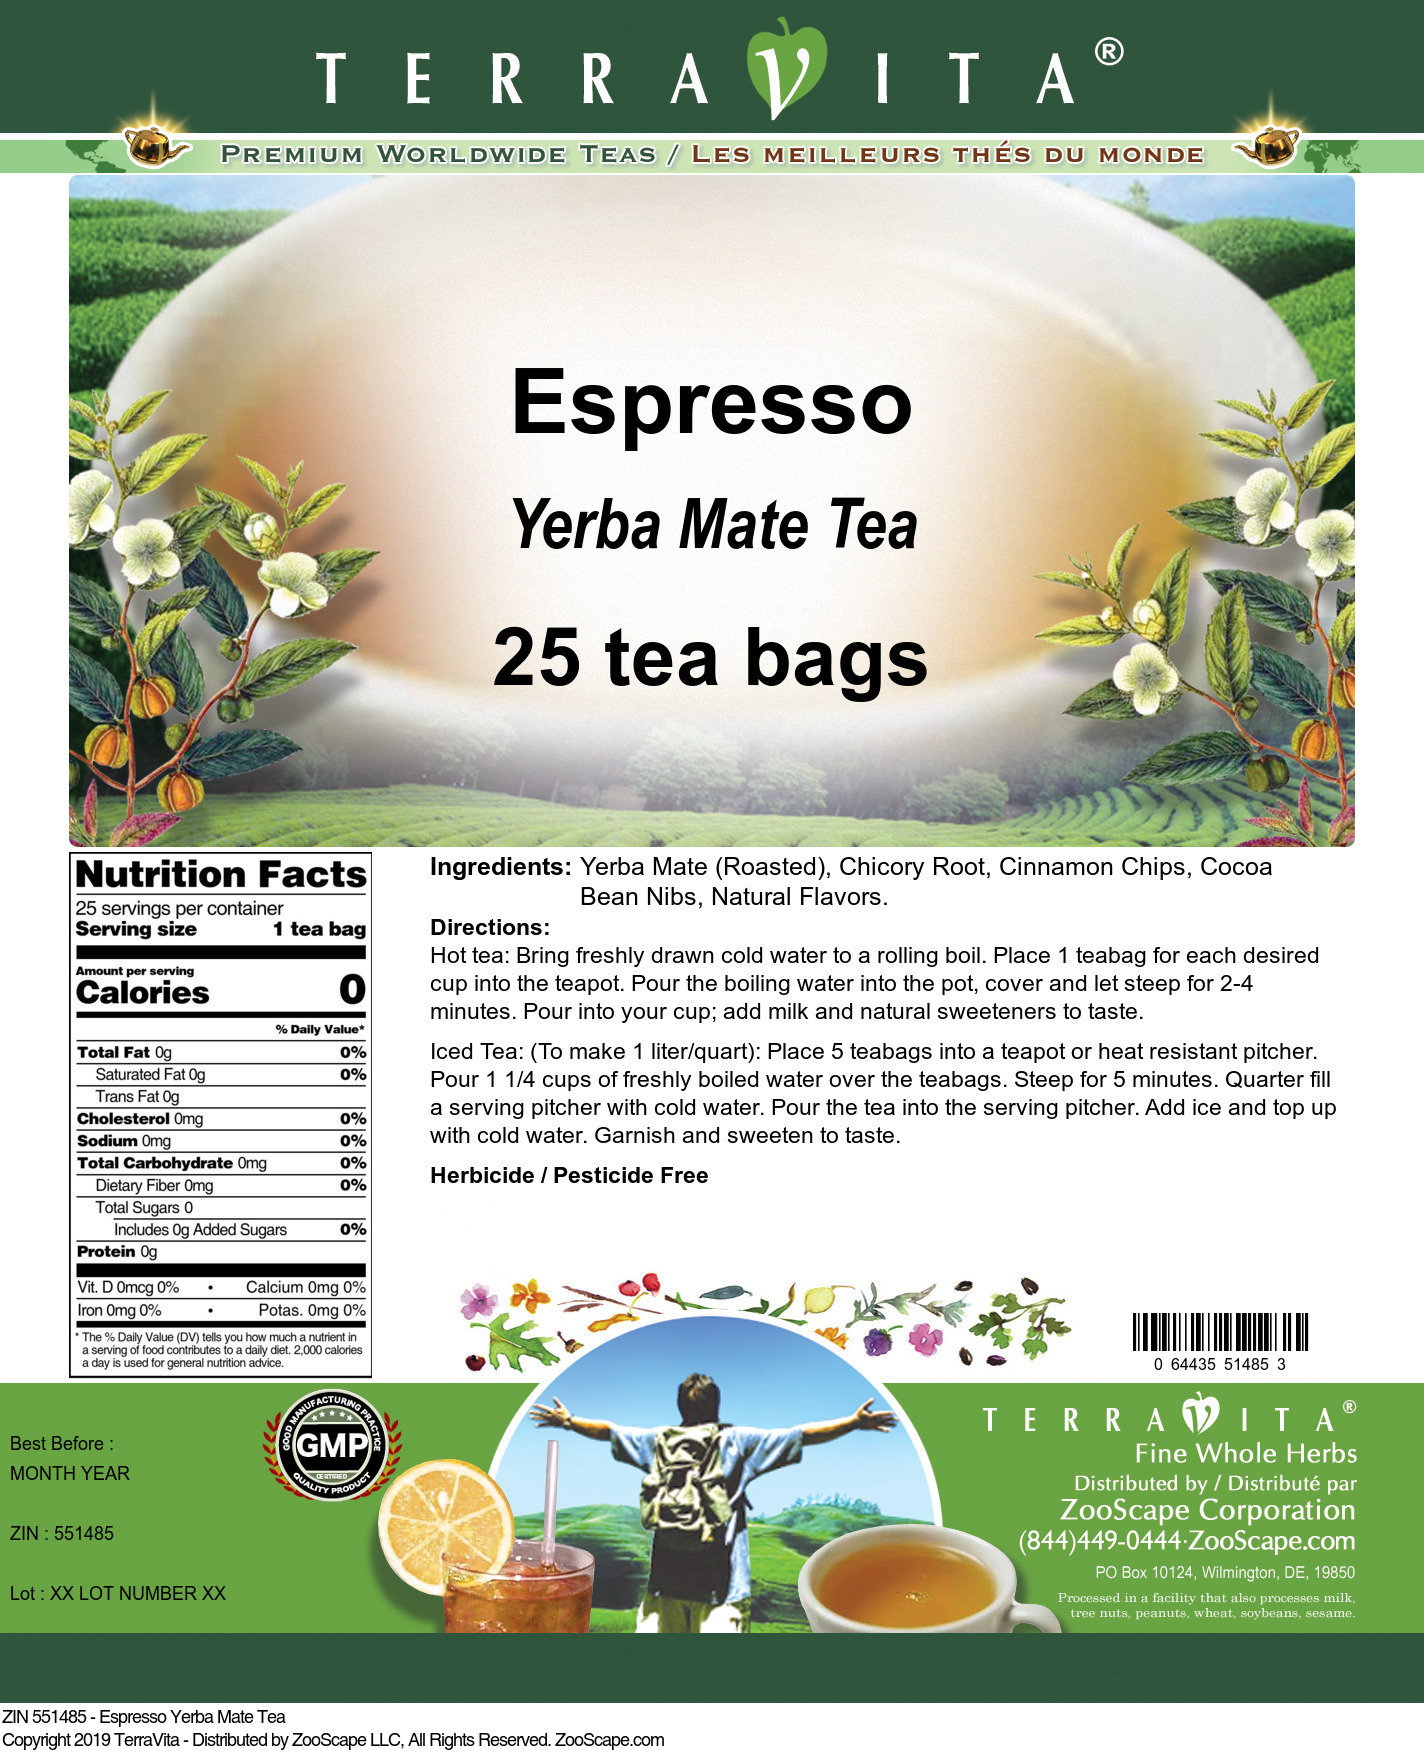 Espresso Yerba Mate Tea